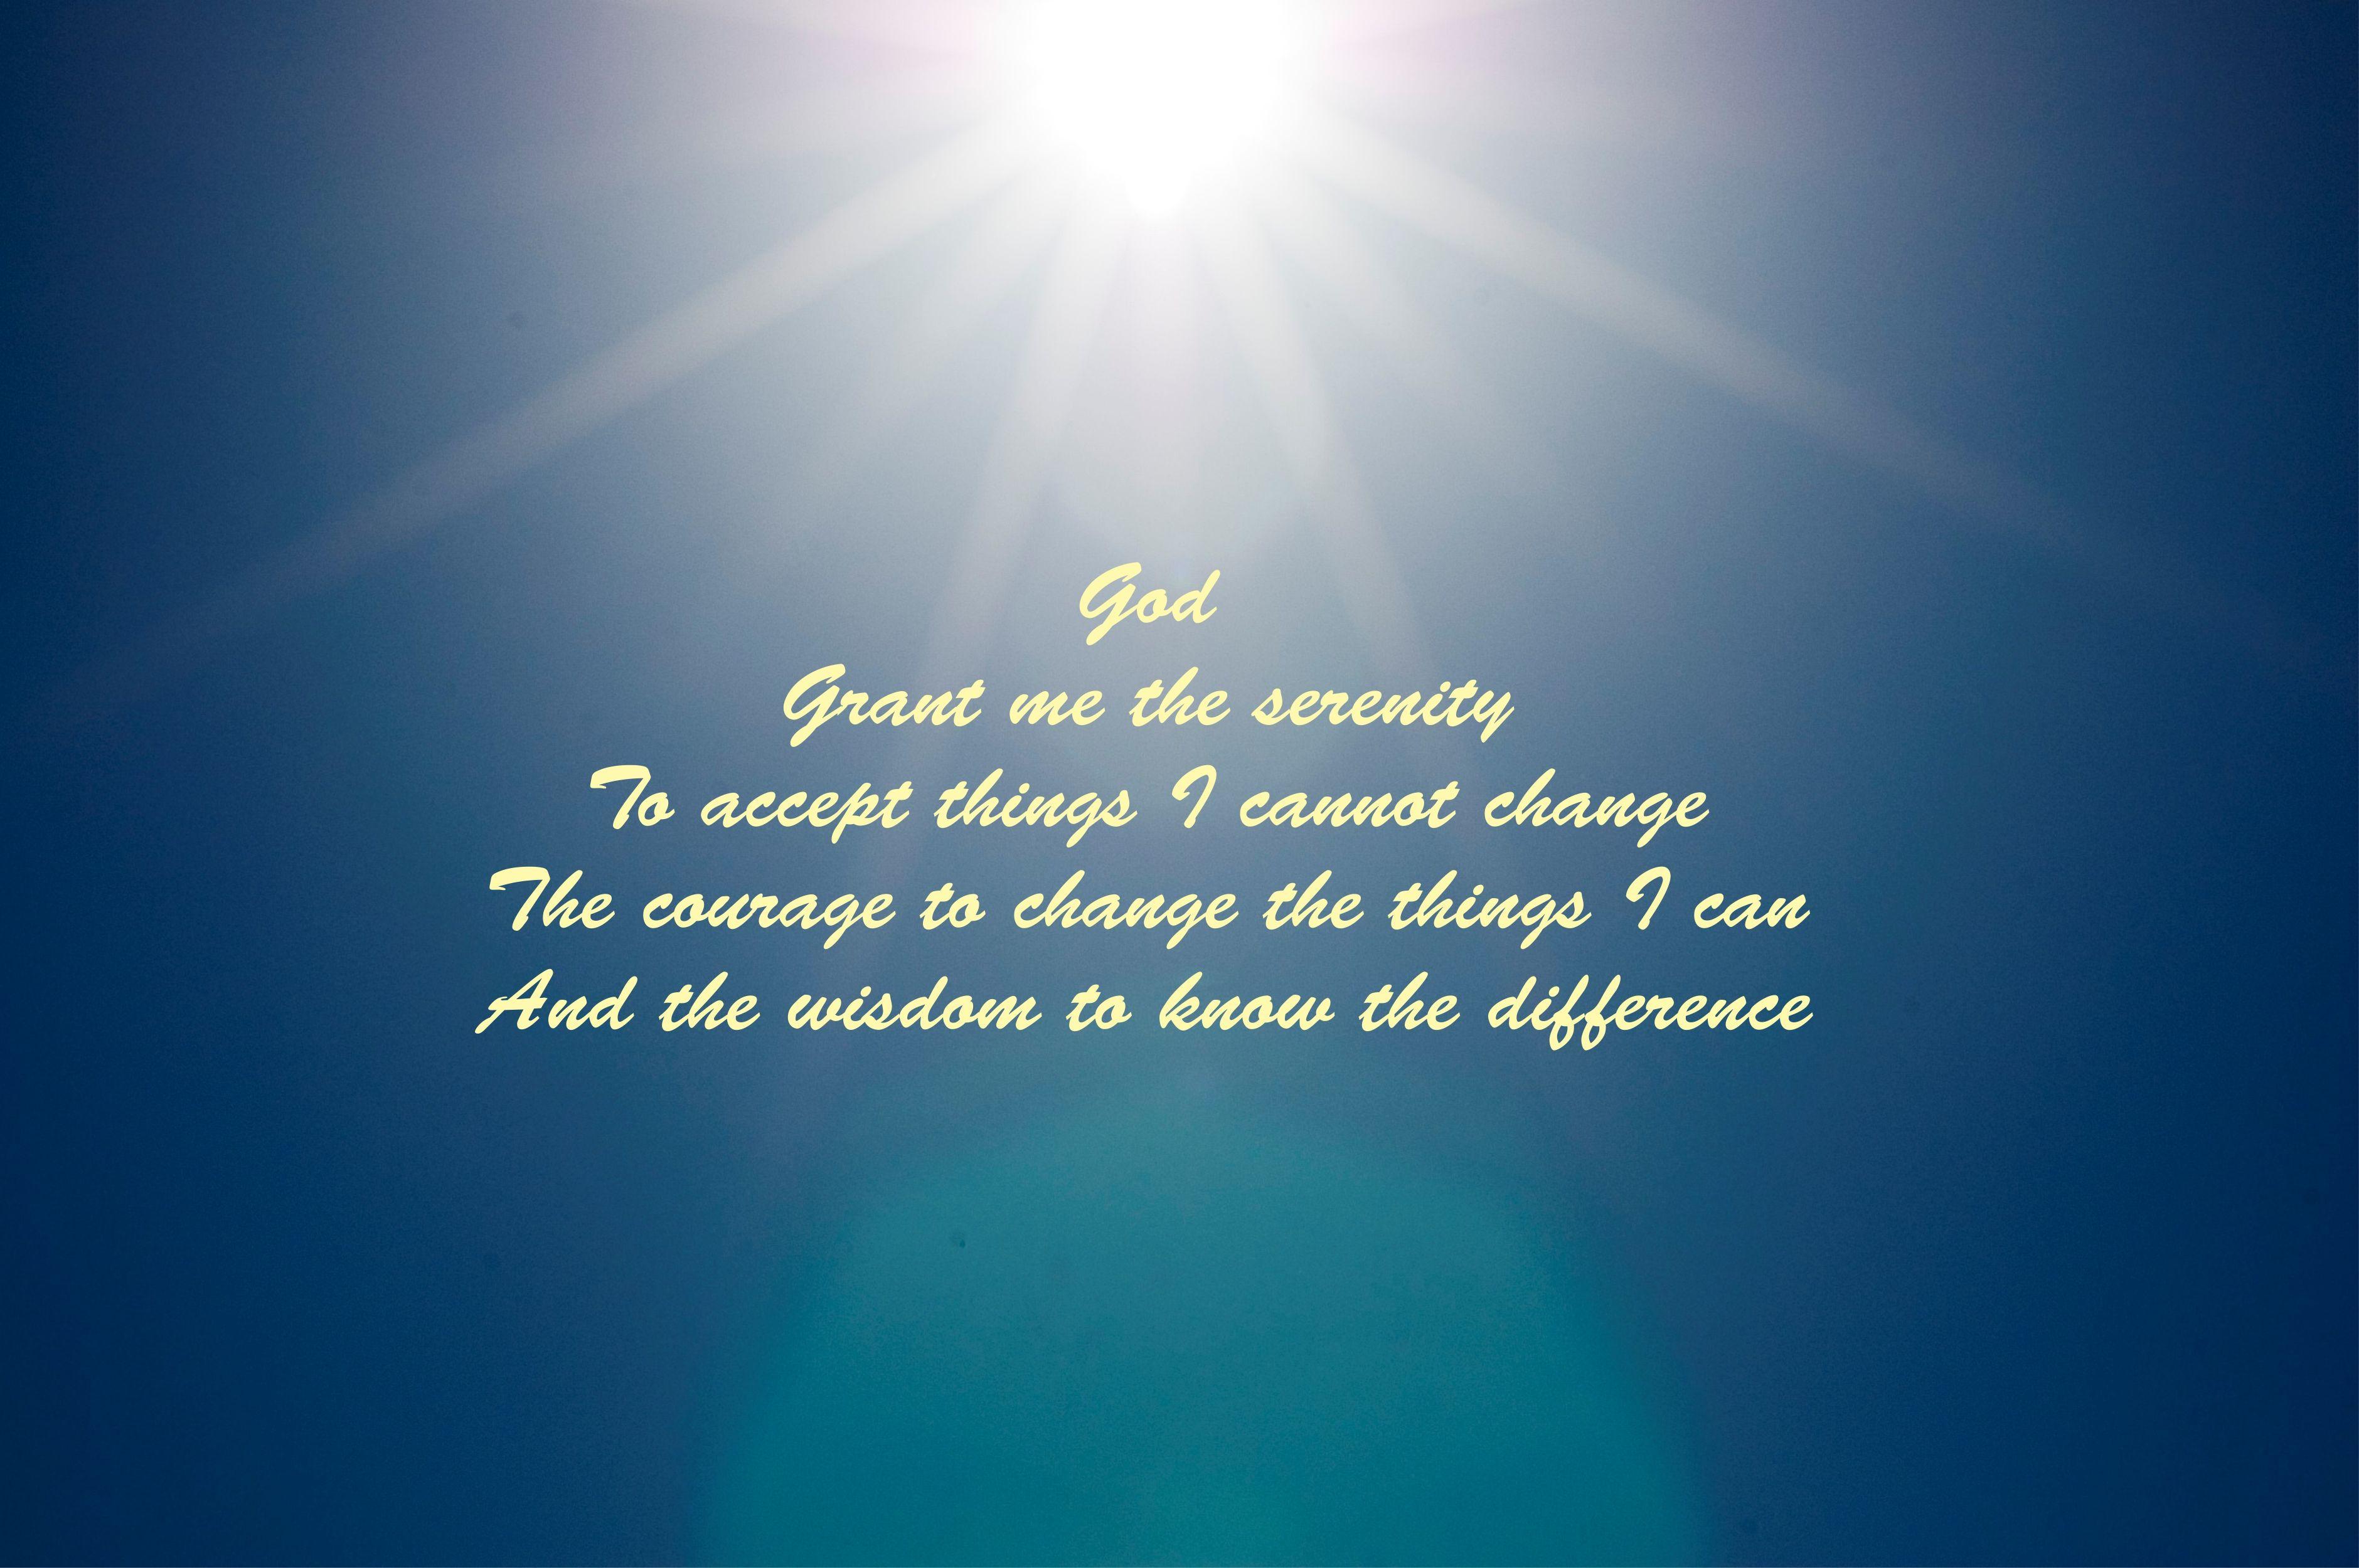 The Serenity Prayer